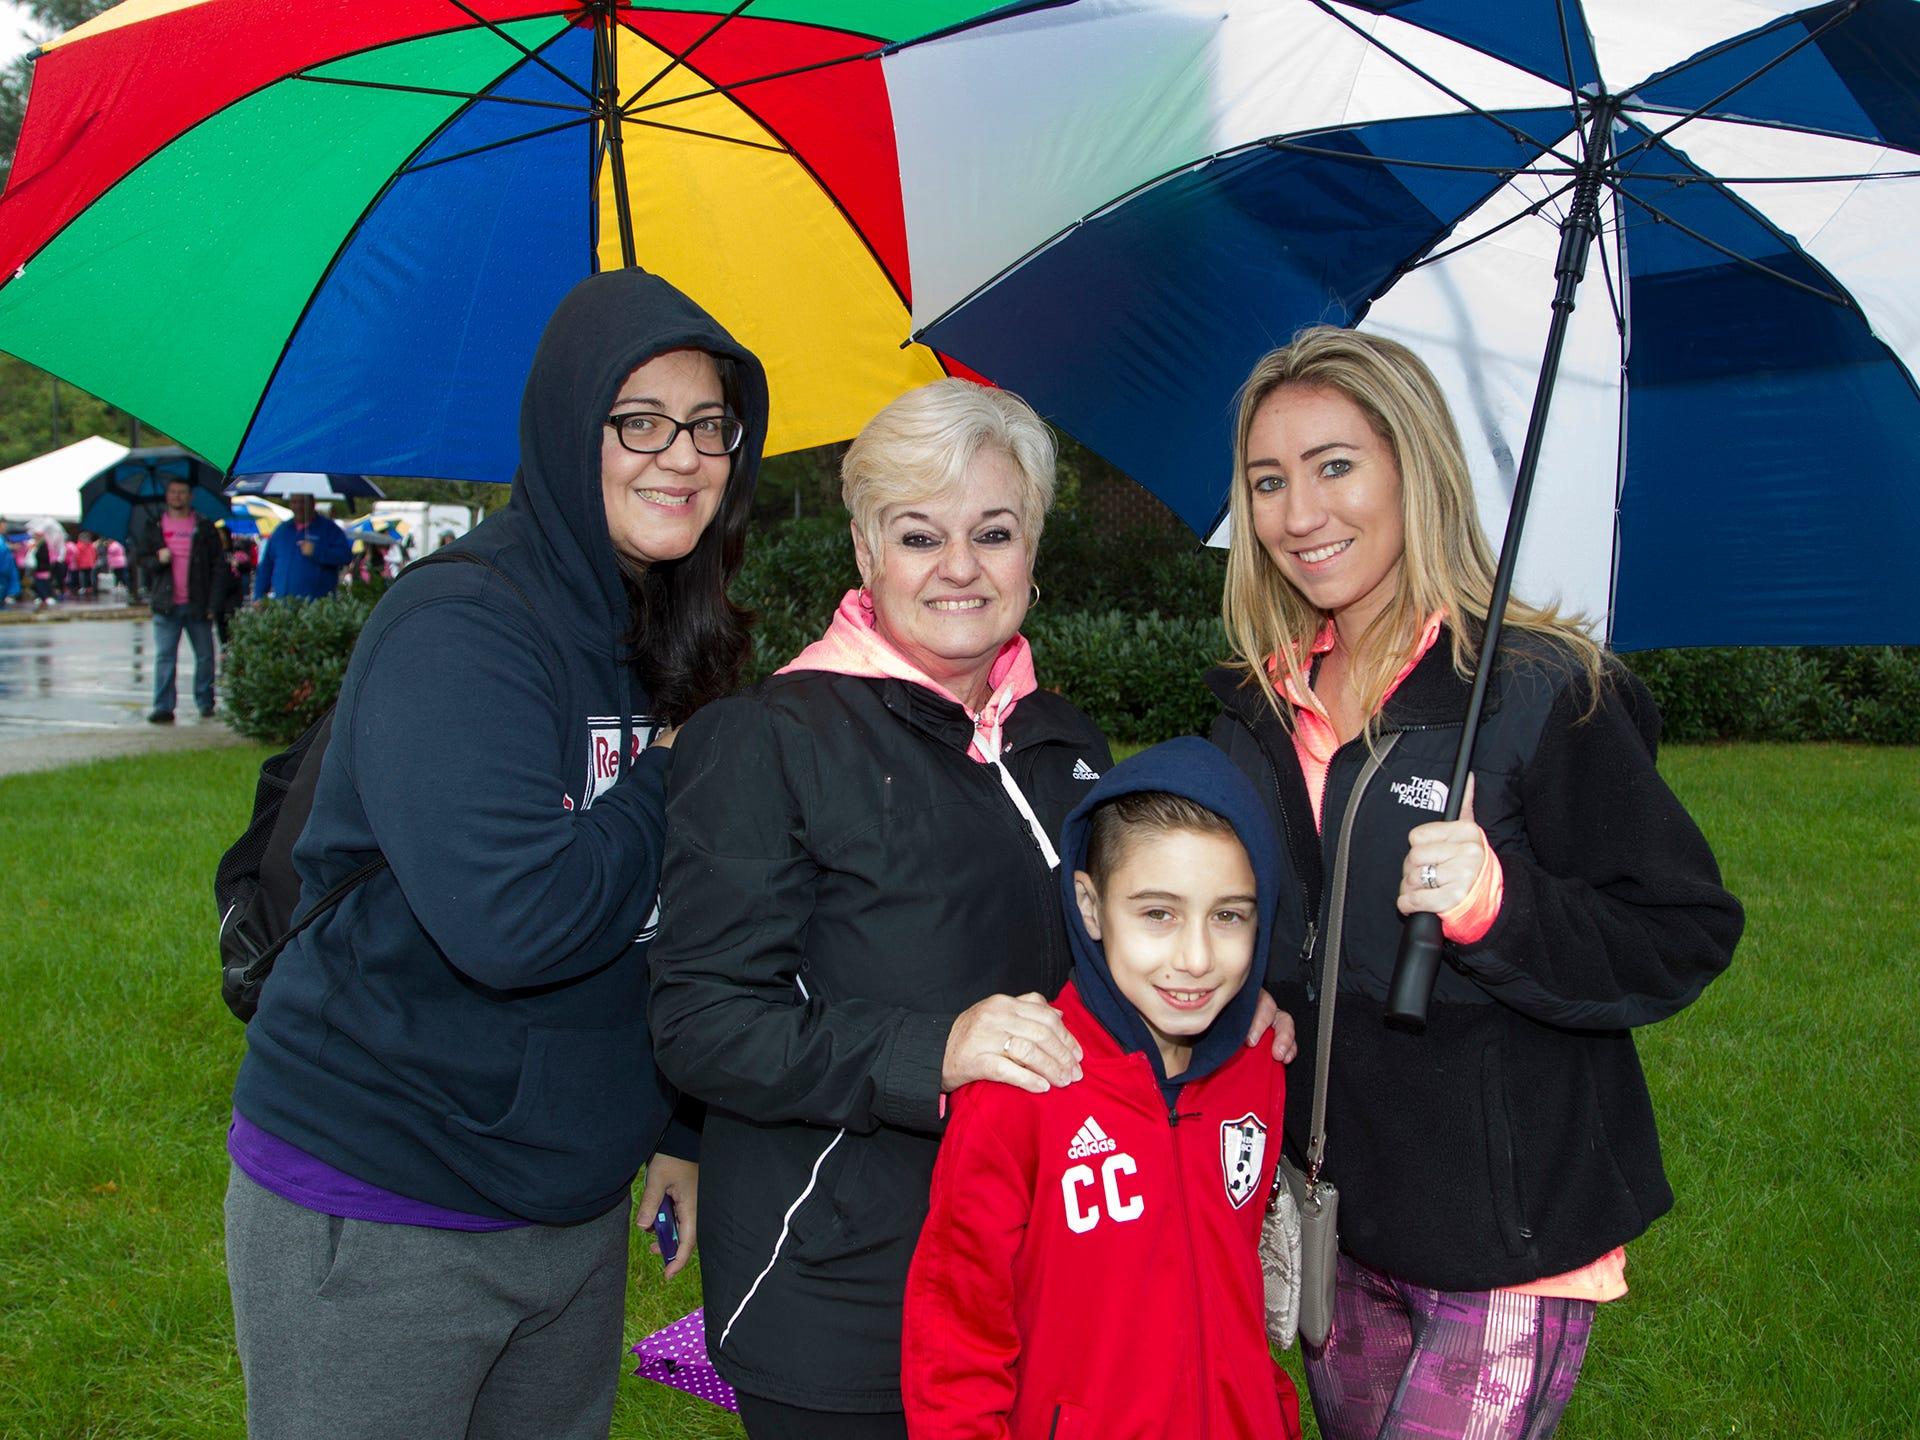 Melissa Cruz, Mercedes Cruz, Cristian Cruz, Tara Cruz. Valley National Bank held its 10th annual Breast Cancer Walk in Wayne. 10/13/2018